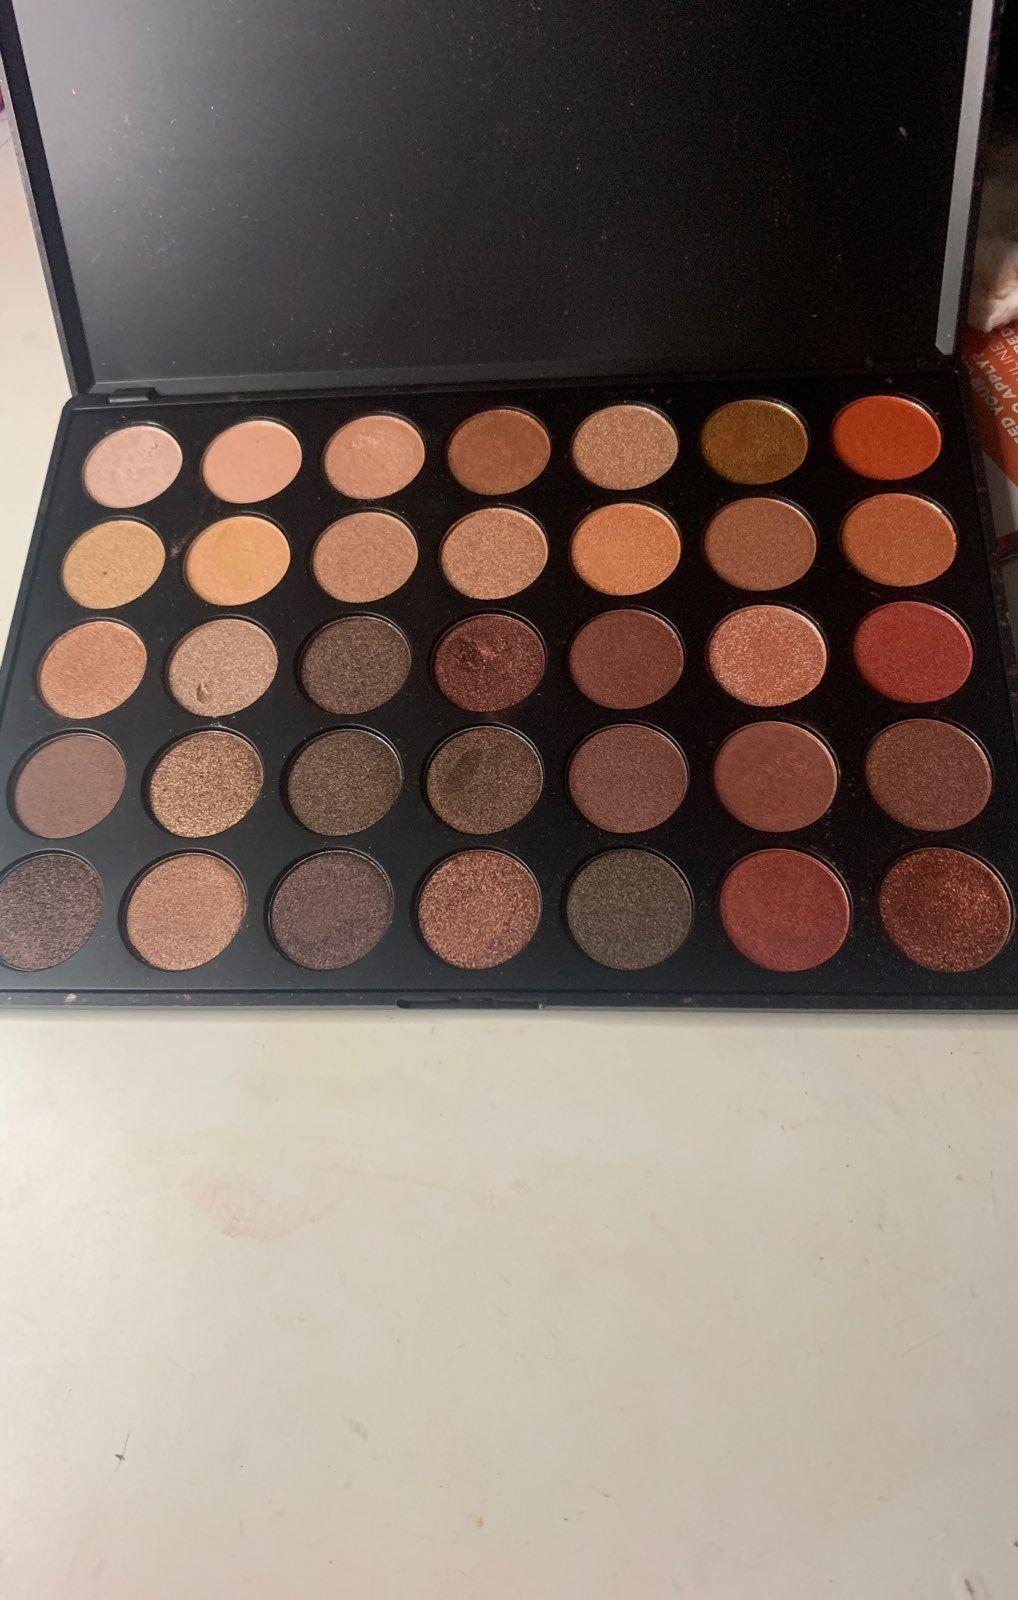 The $6 Morphe 3B Eyeshadow Palette is Pretty Damn Good